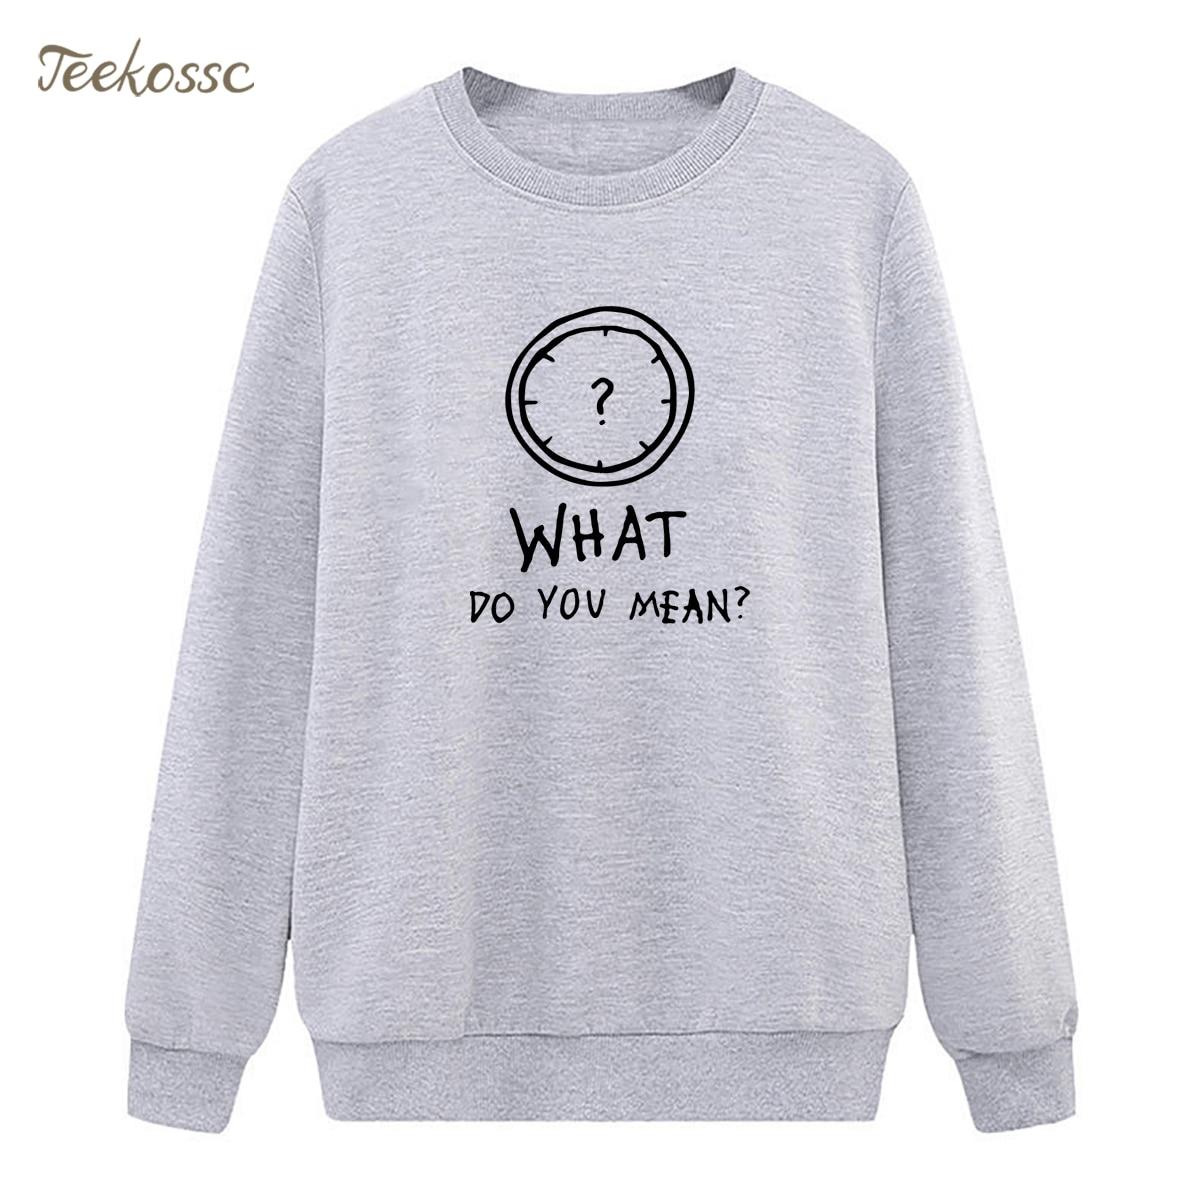 Clock What do you mean ? Sweatshirt Funny Print Hoodie 2018 Winter Autumn Women Lasdies Pullover Fleece Loose Casual Streetwear